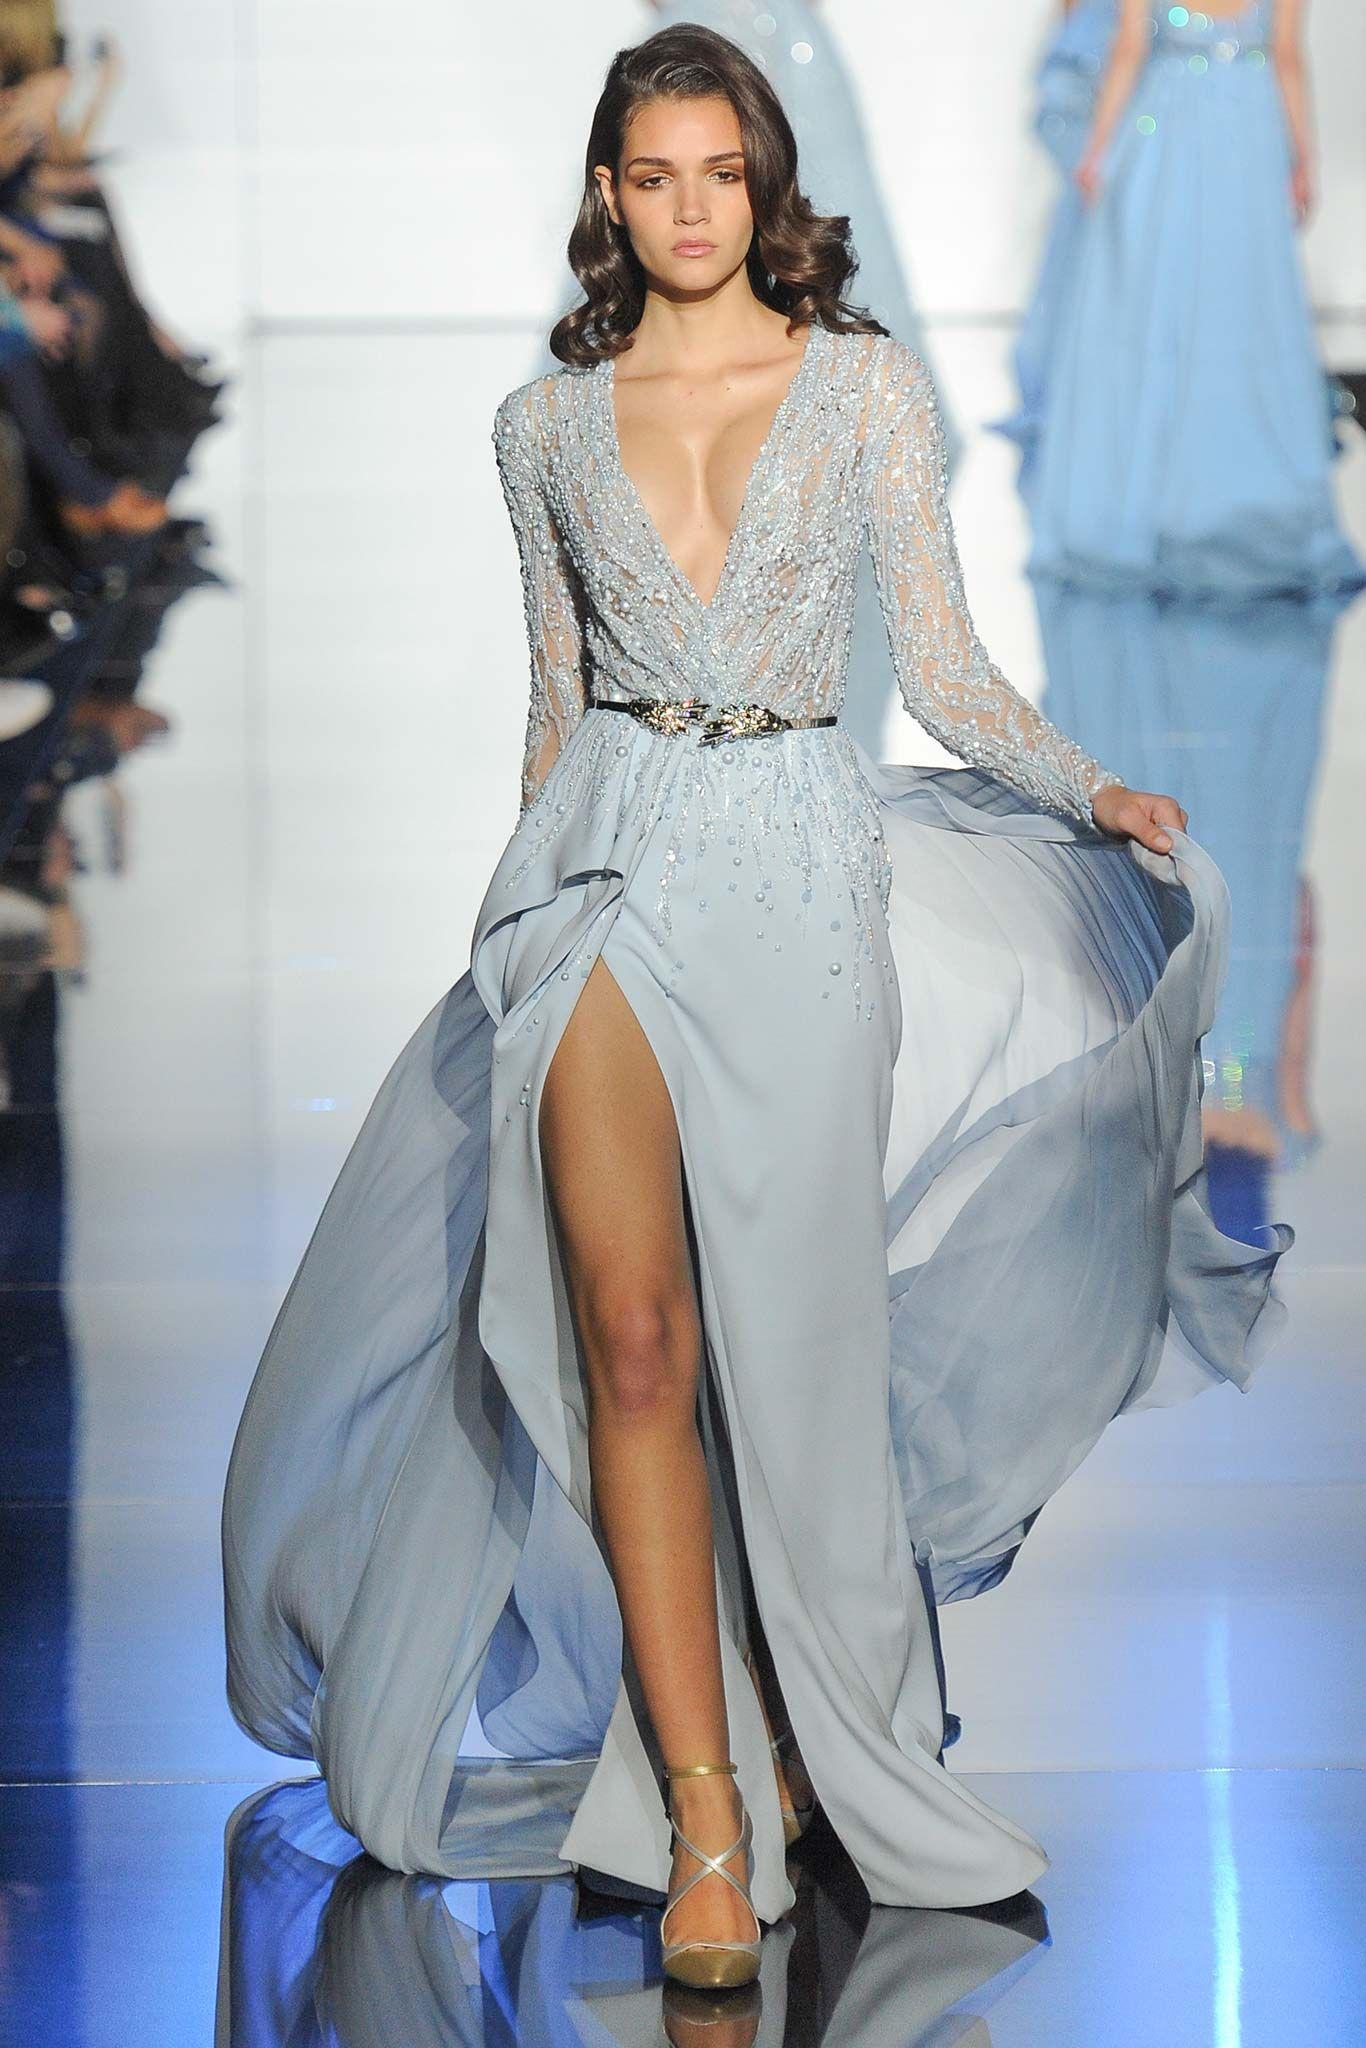 YVL_0965 | Gorgeous dresses! | Pinterest | Zahir murad, Zuhair murad ...